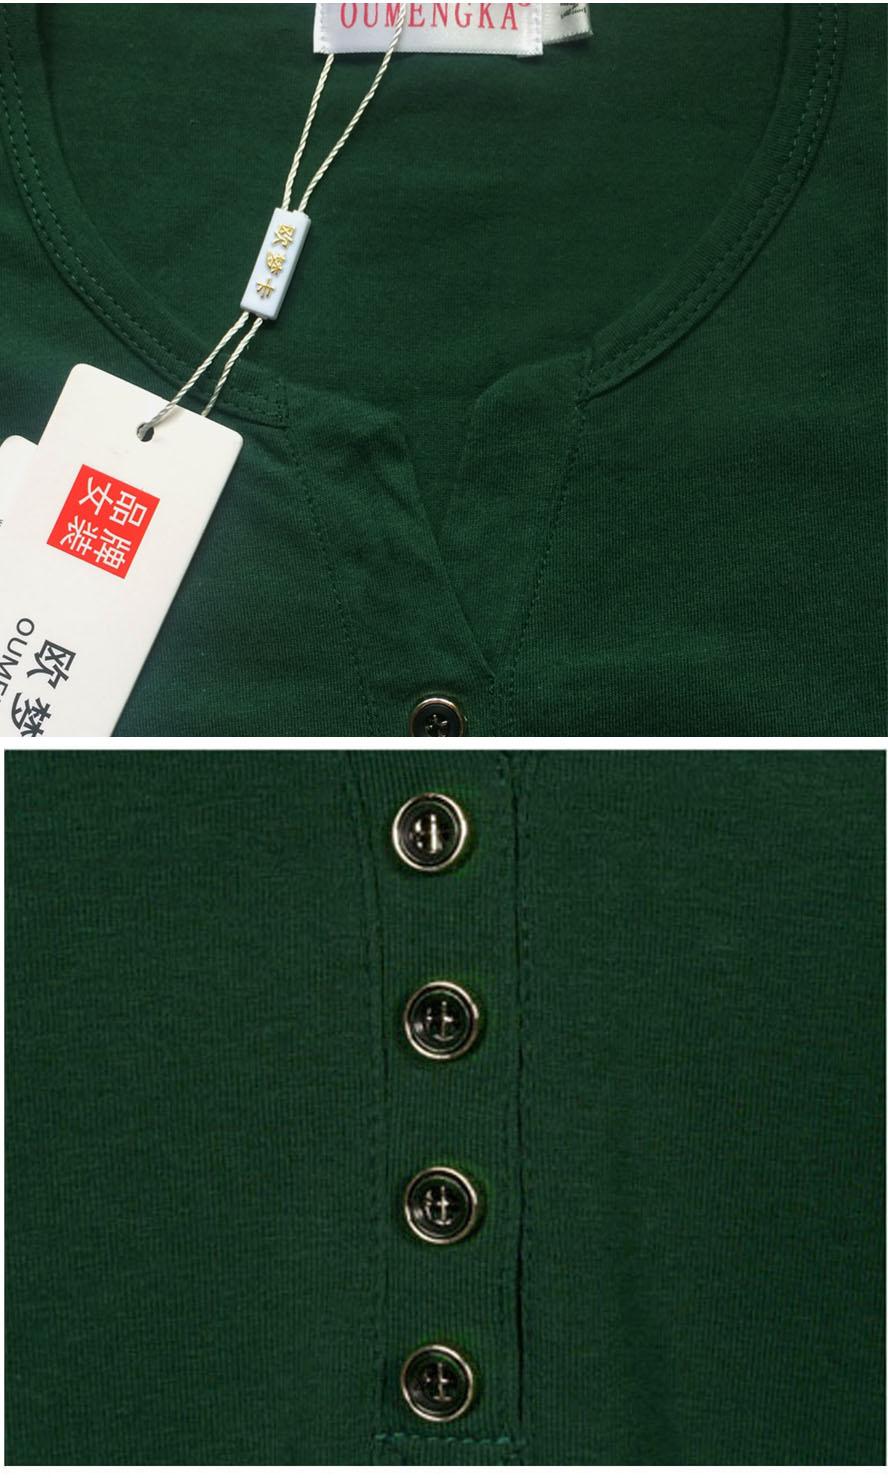 HTB17TKARXXXXXaIXFXXq6xXFXXXt - New Autumn Long Sleeve t-shirt Solid Womens Tops Fashion